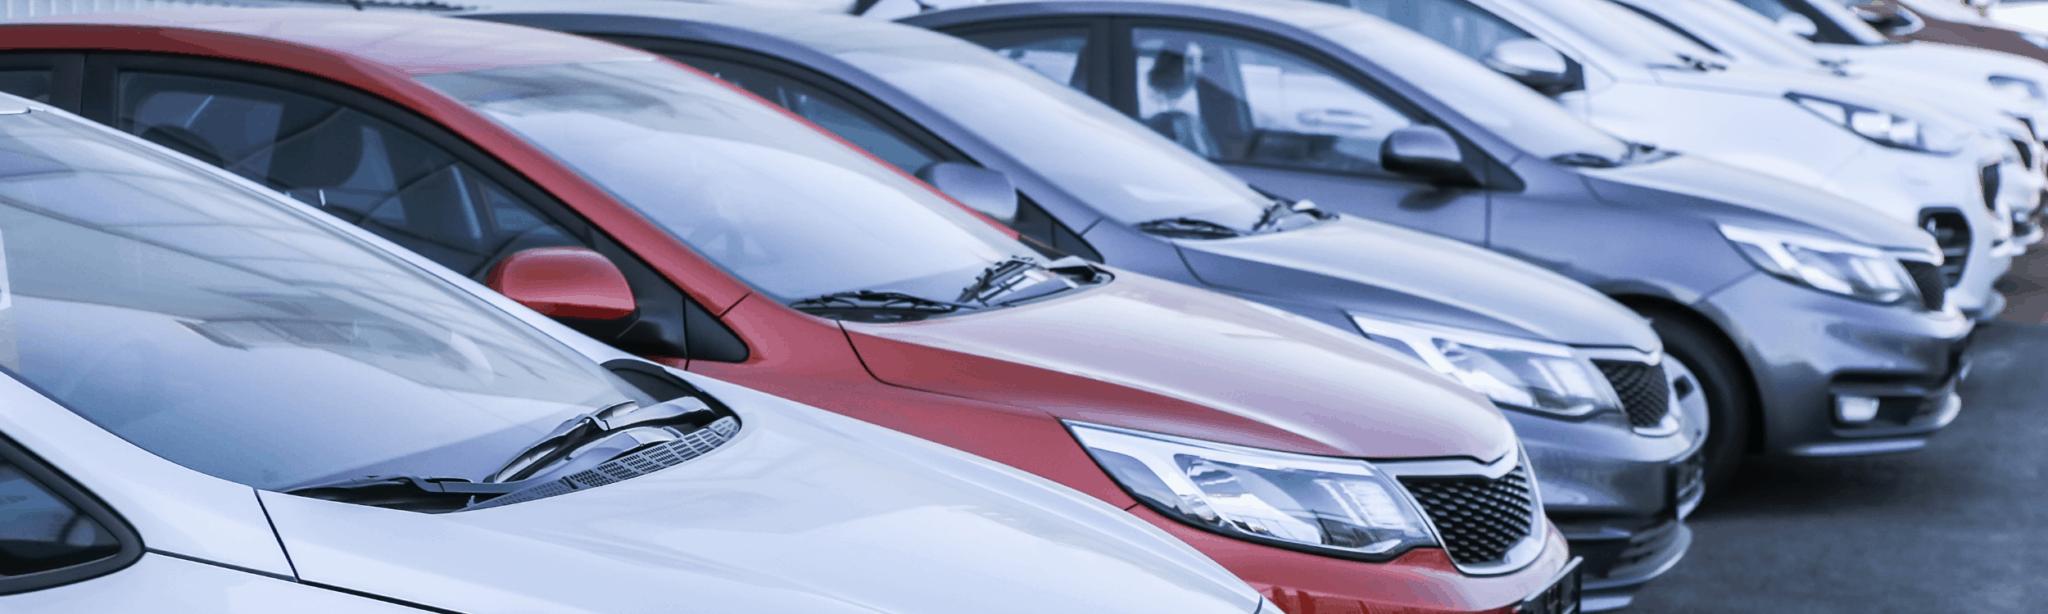 Car Dealer Reviews | 2020 Best Car Release Date